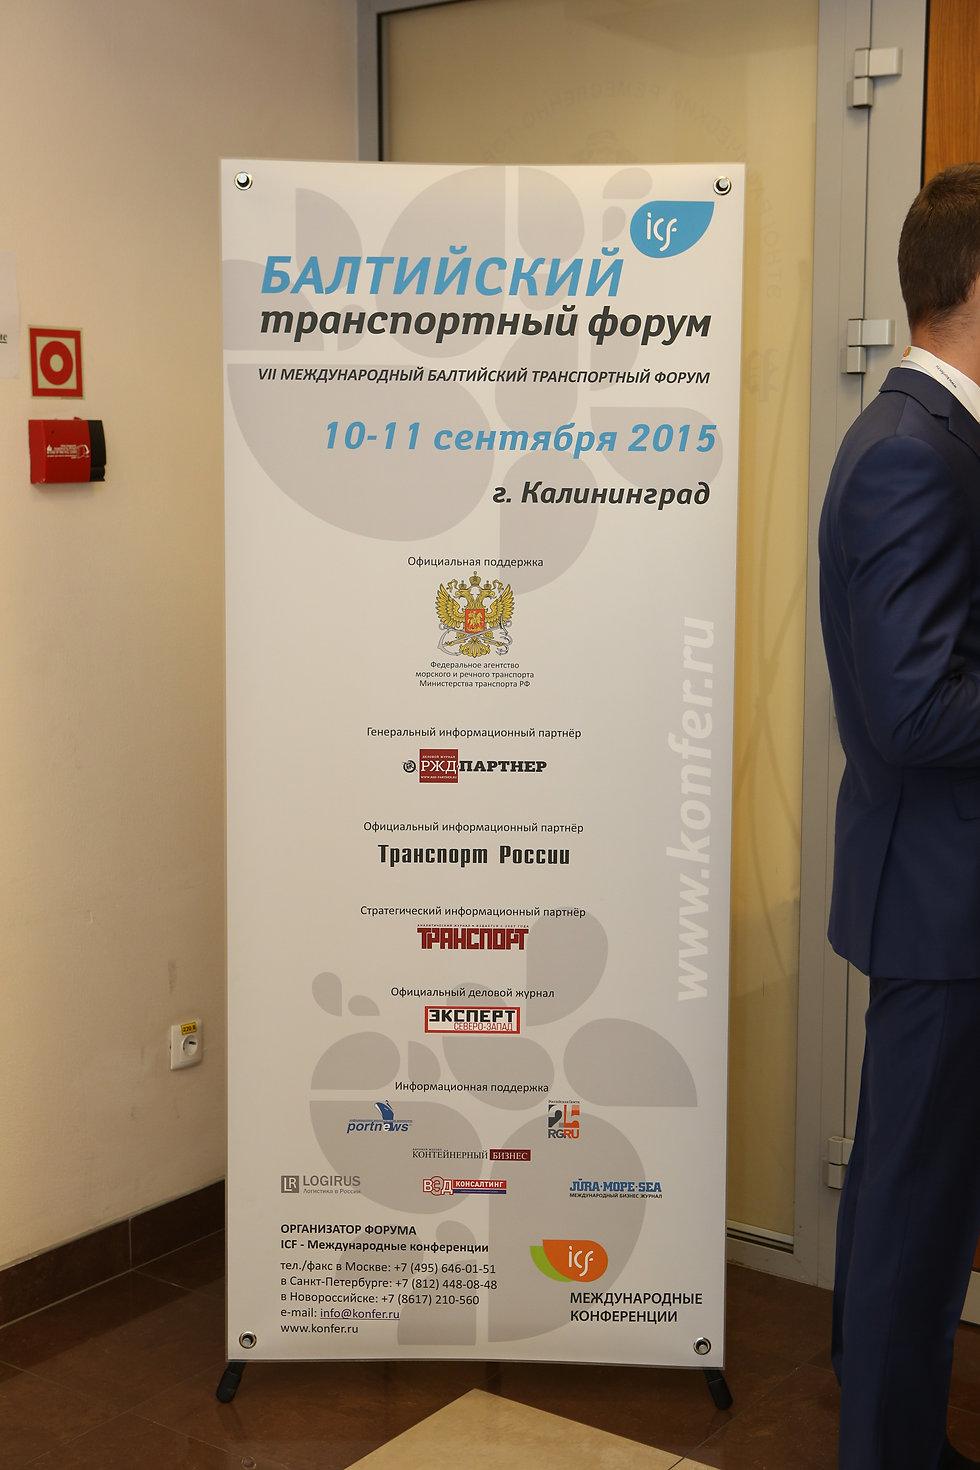 VII Балтийский транспортный форум